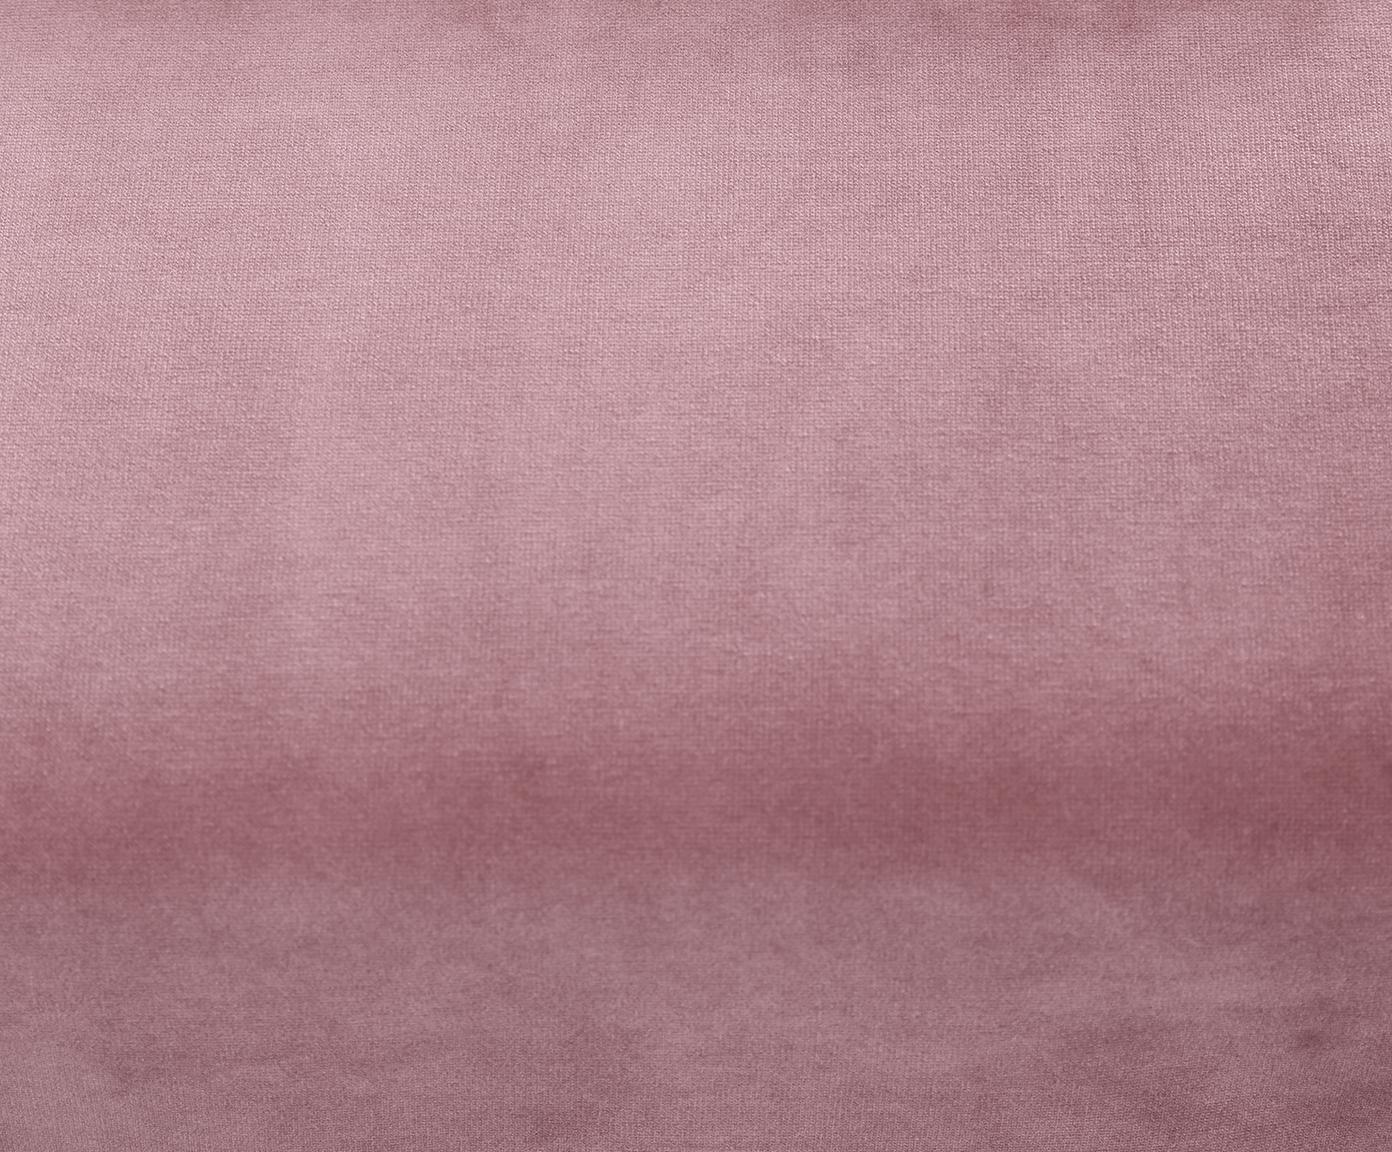 Fluwelen fauteuil Fluente, Bekleding: fluweel (hoogwaardig poly, Frame: massief grenenhout, Poten: gelakt metaal, Roze, B 76 x D 83 cm